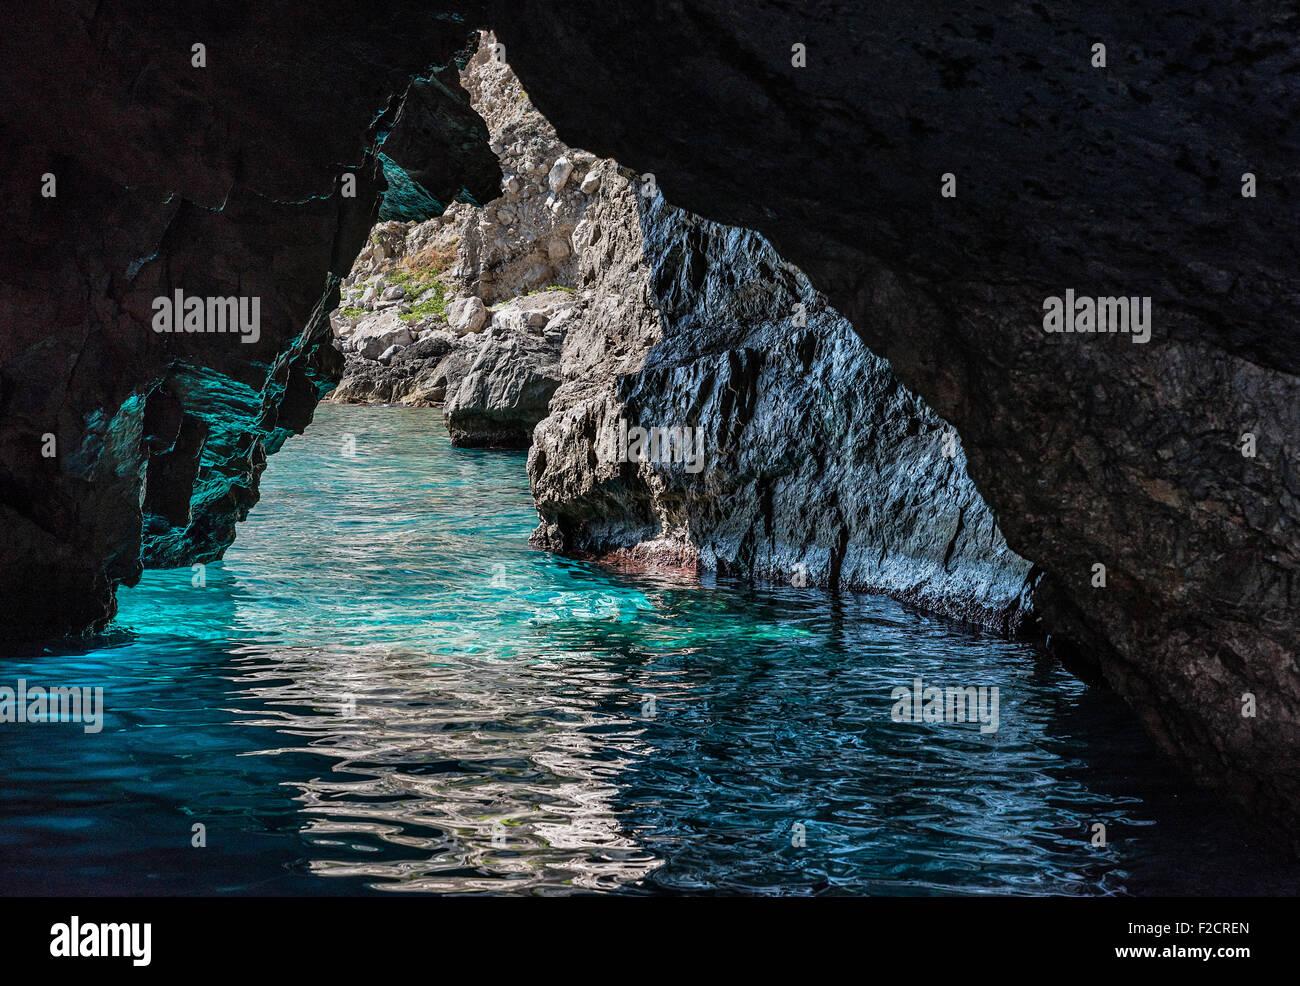 The Grotta Verde, green grotto, on the island of Capri, Campania, Italy Stock Photo